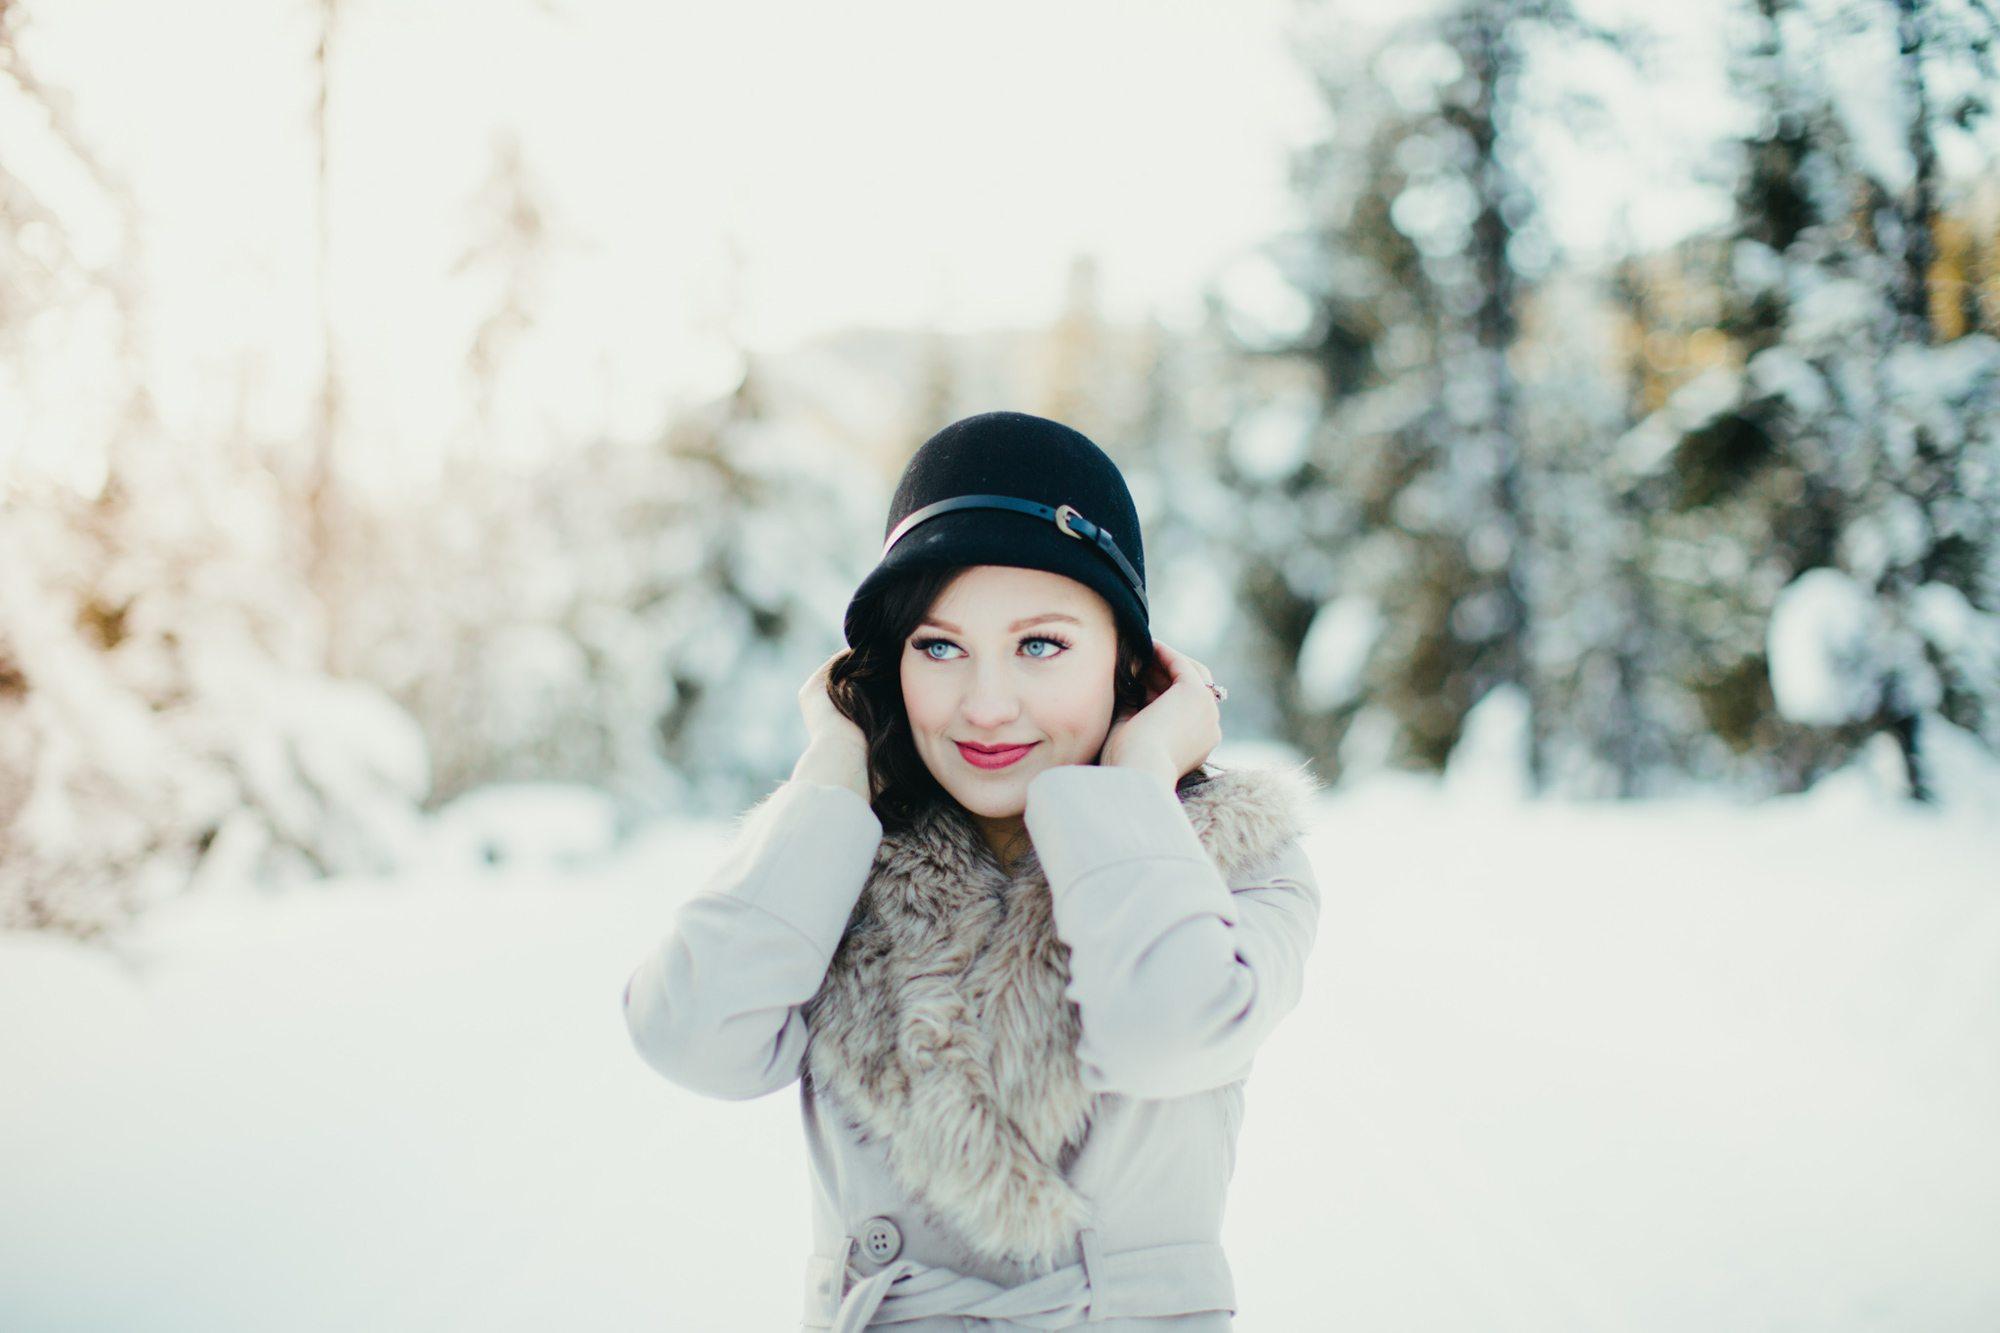 028-adventure-engagement-photographer